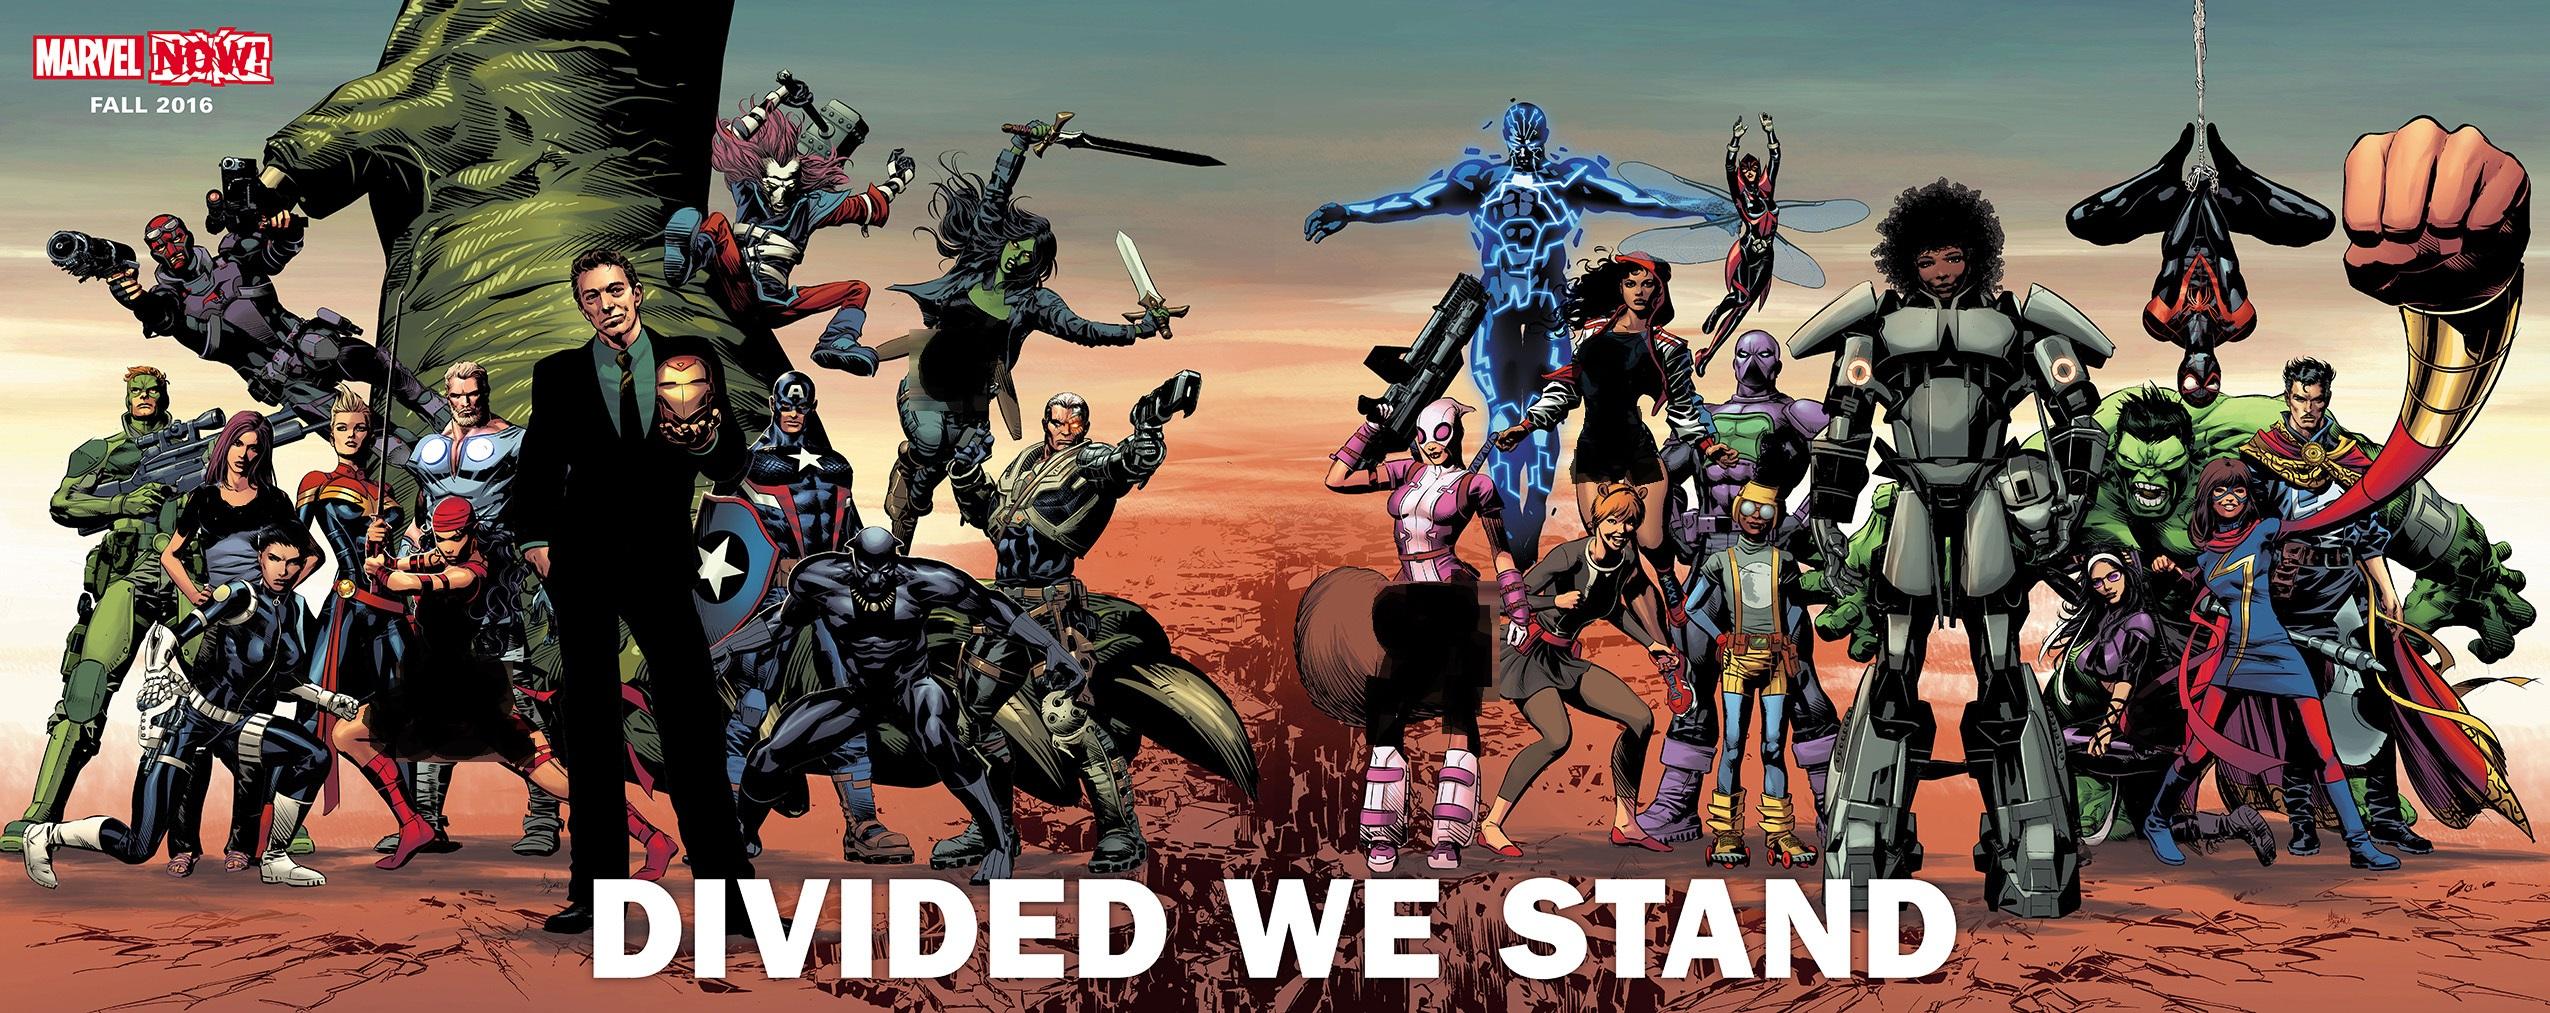 کمیک بوک devided we stand